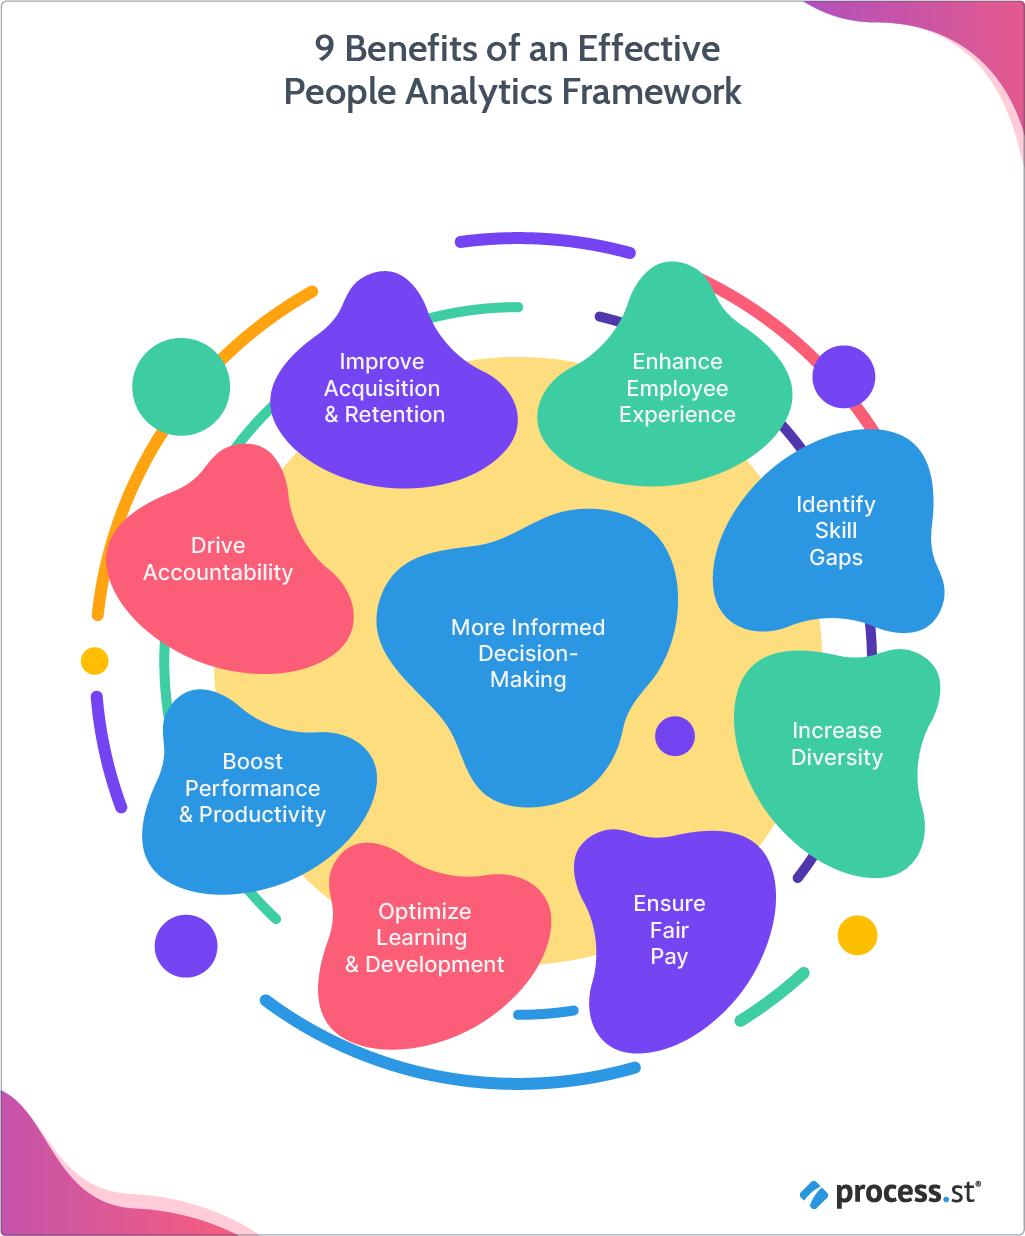 9 Benefits of an Effective People Analytics Framework